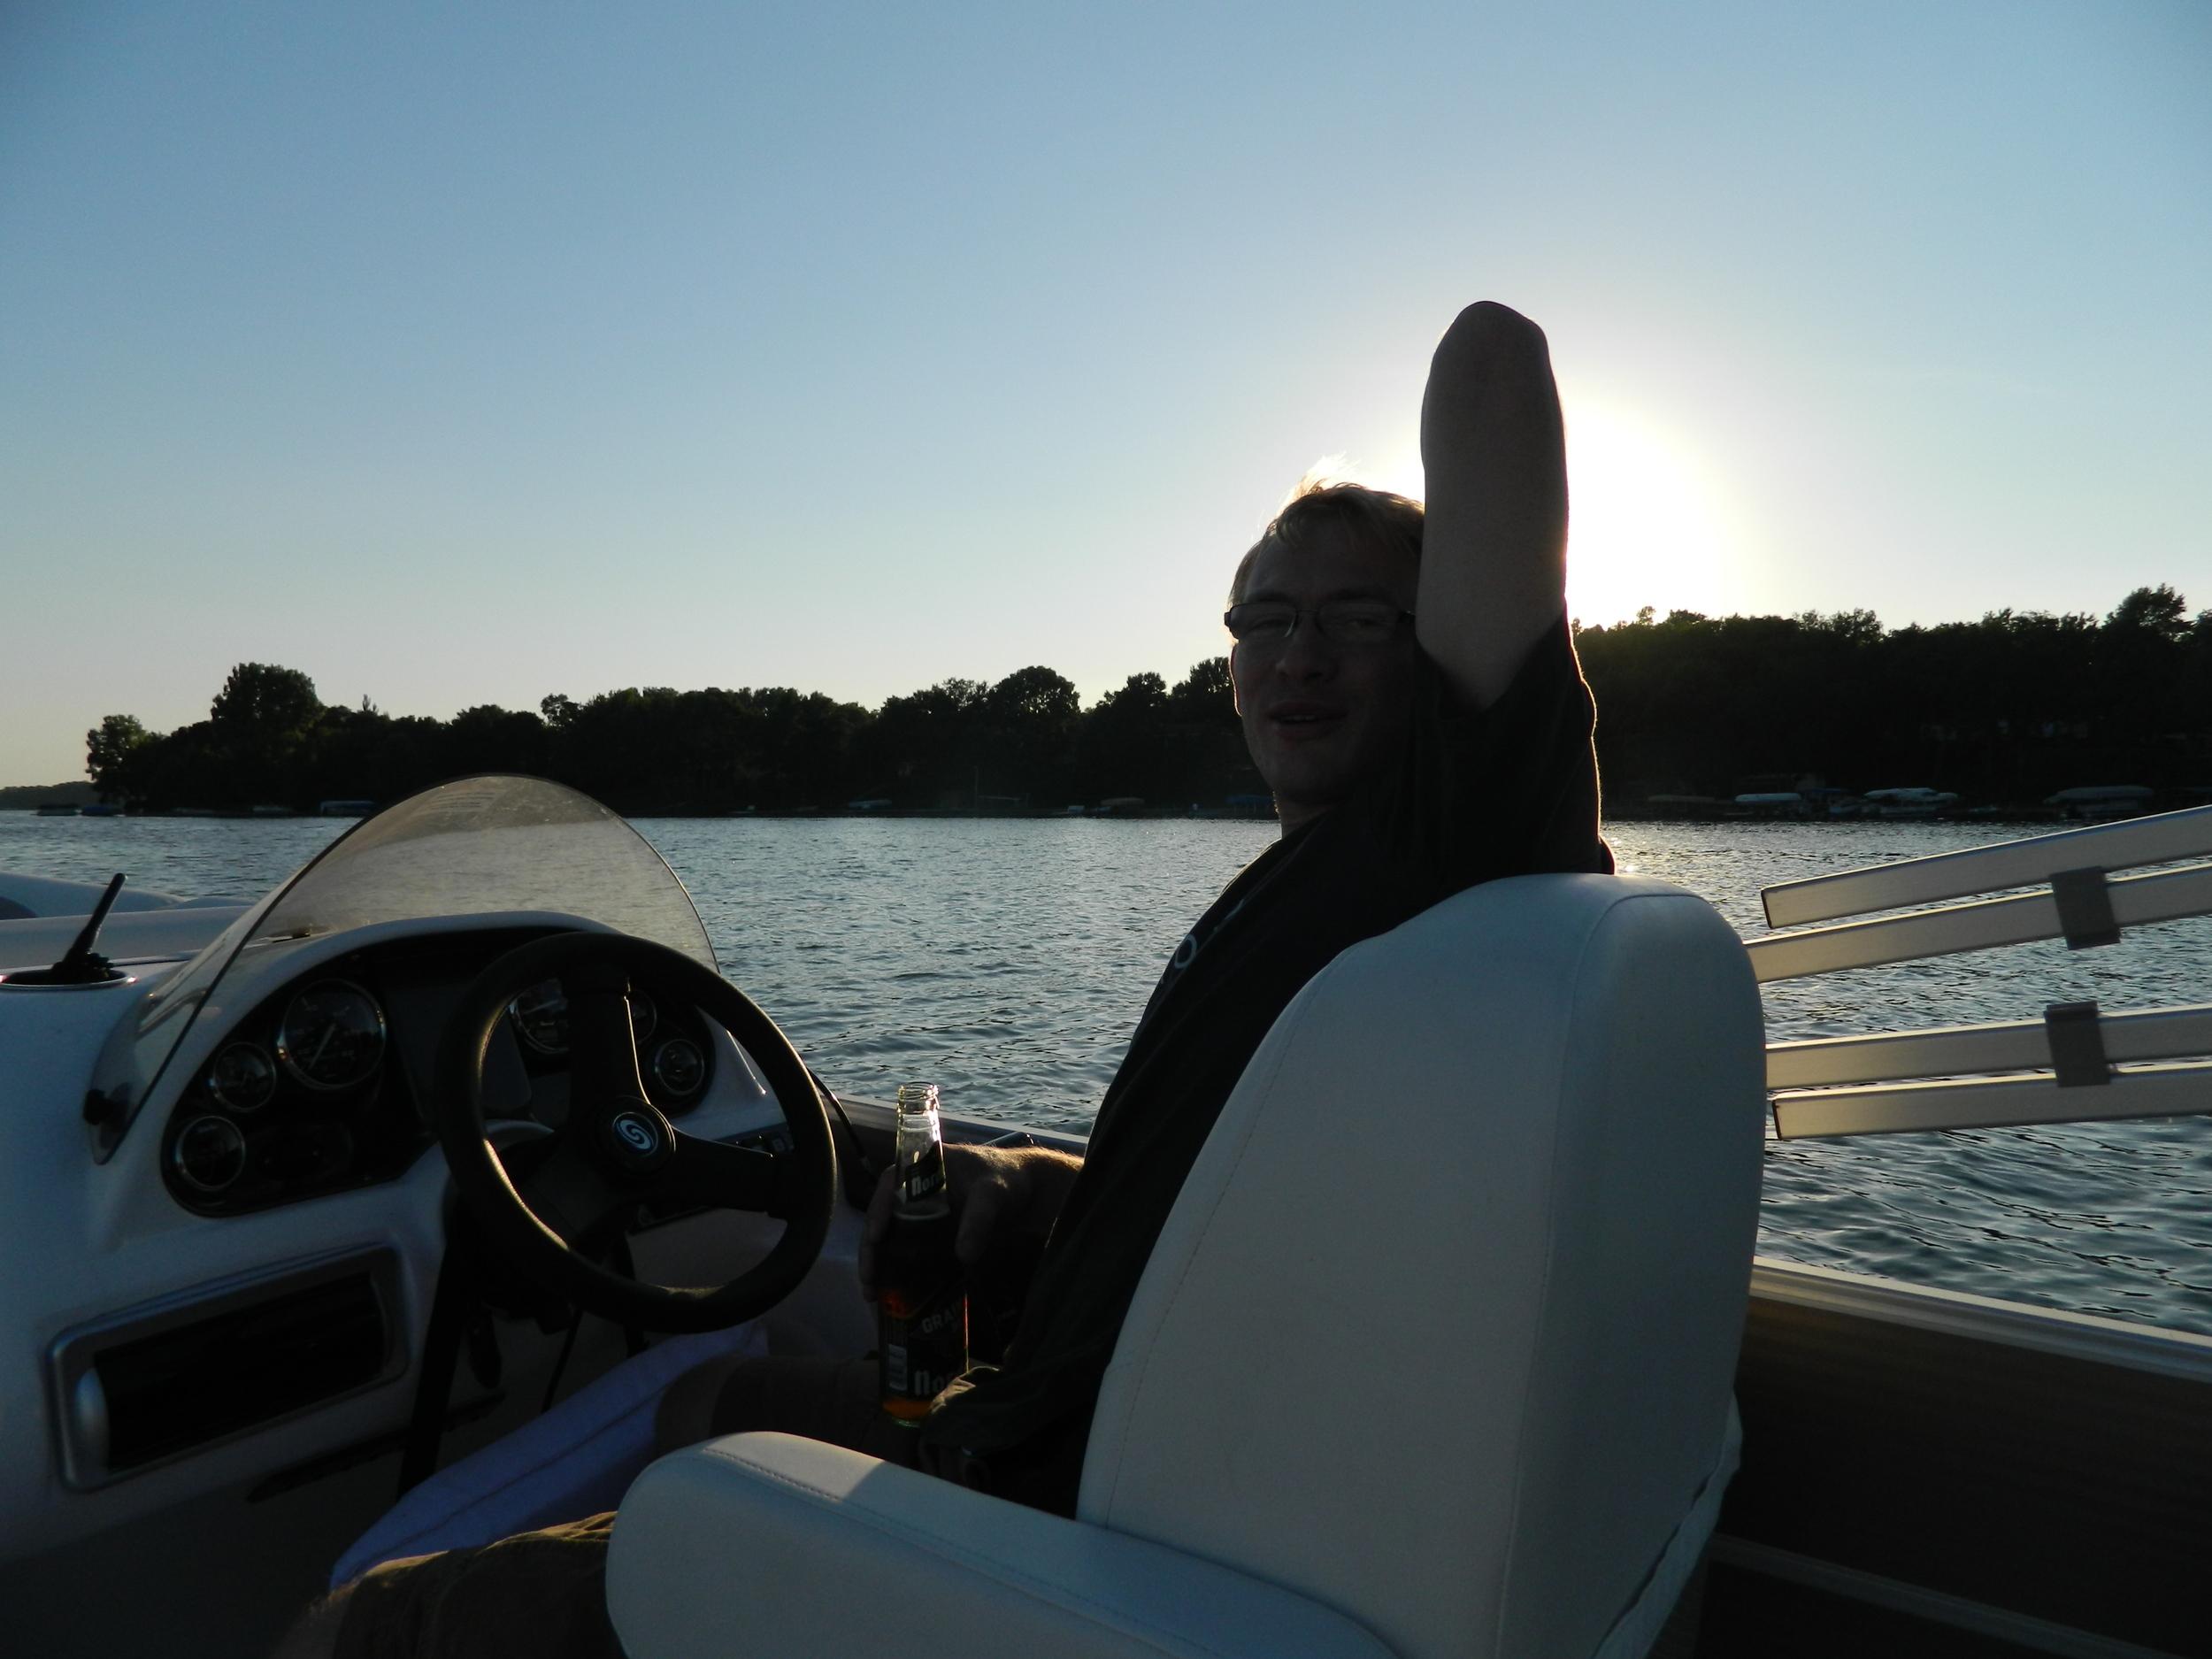 Sunset boat ride